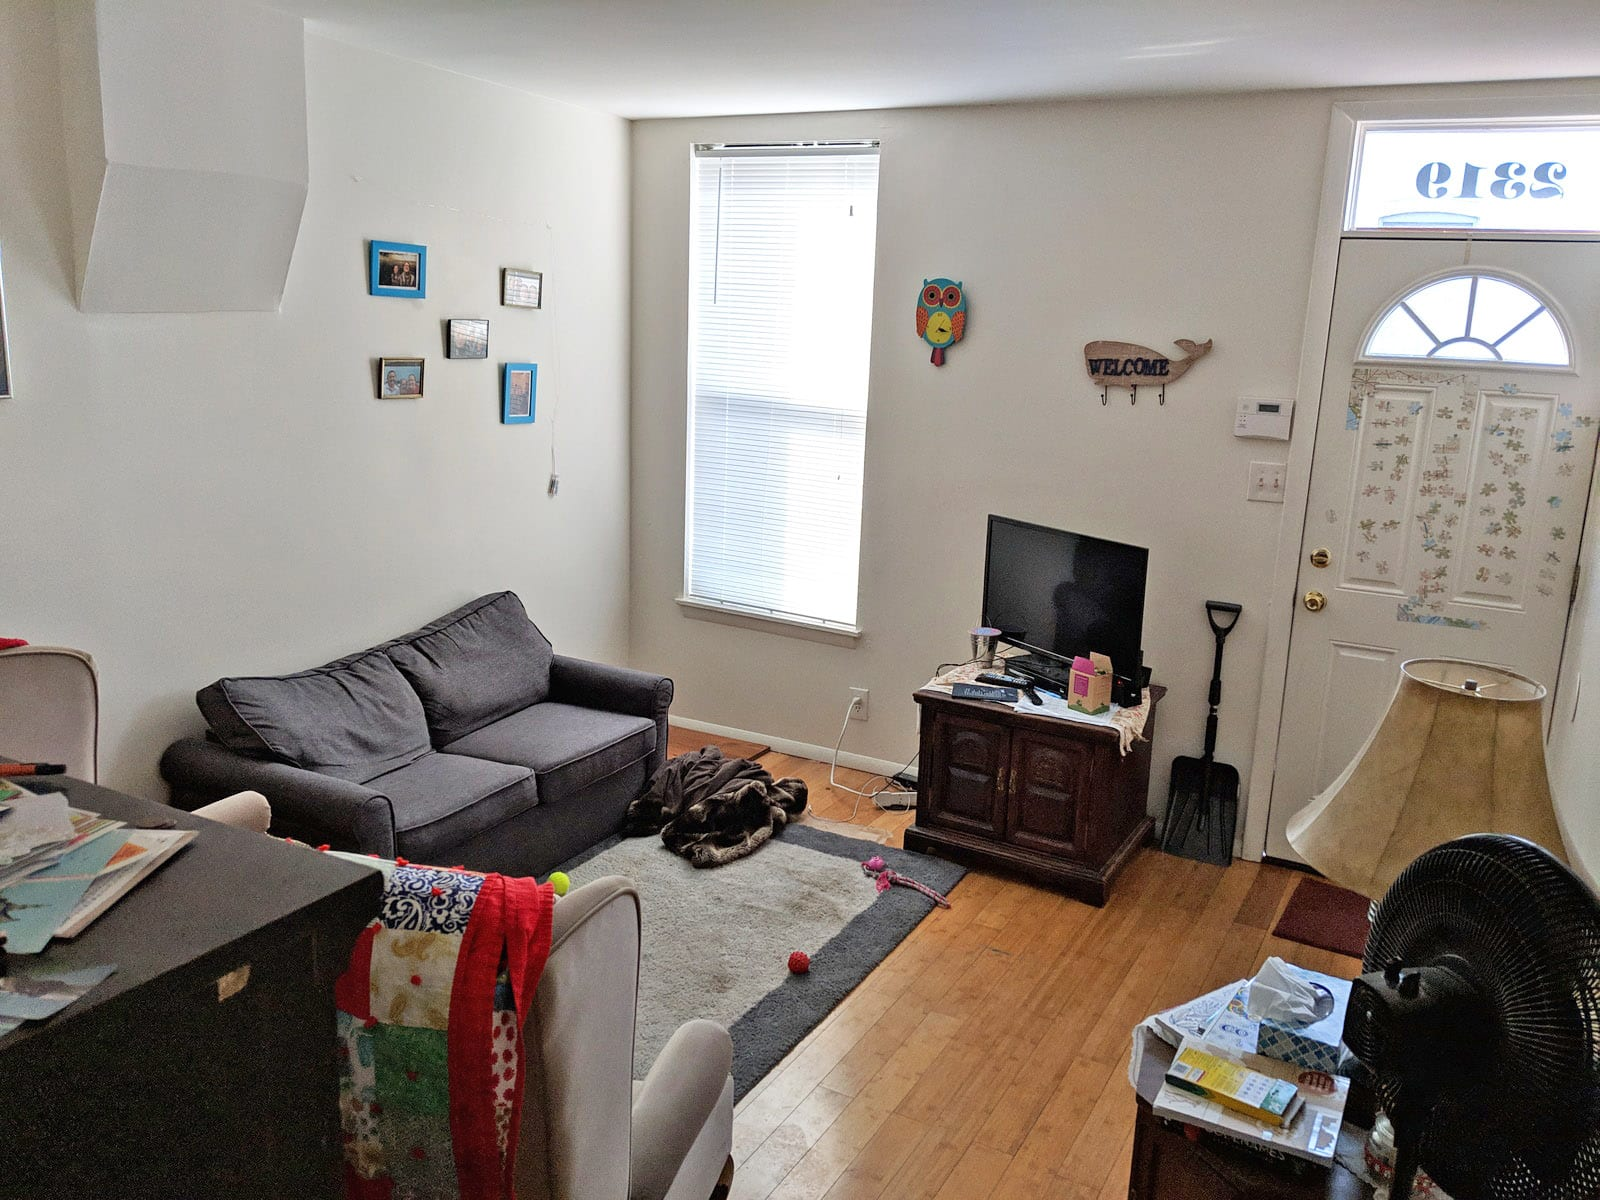 291 2319 Living Room